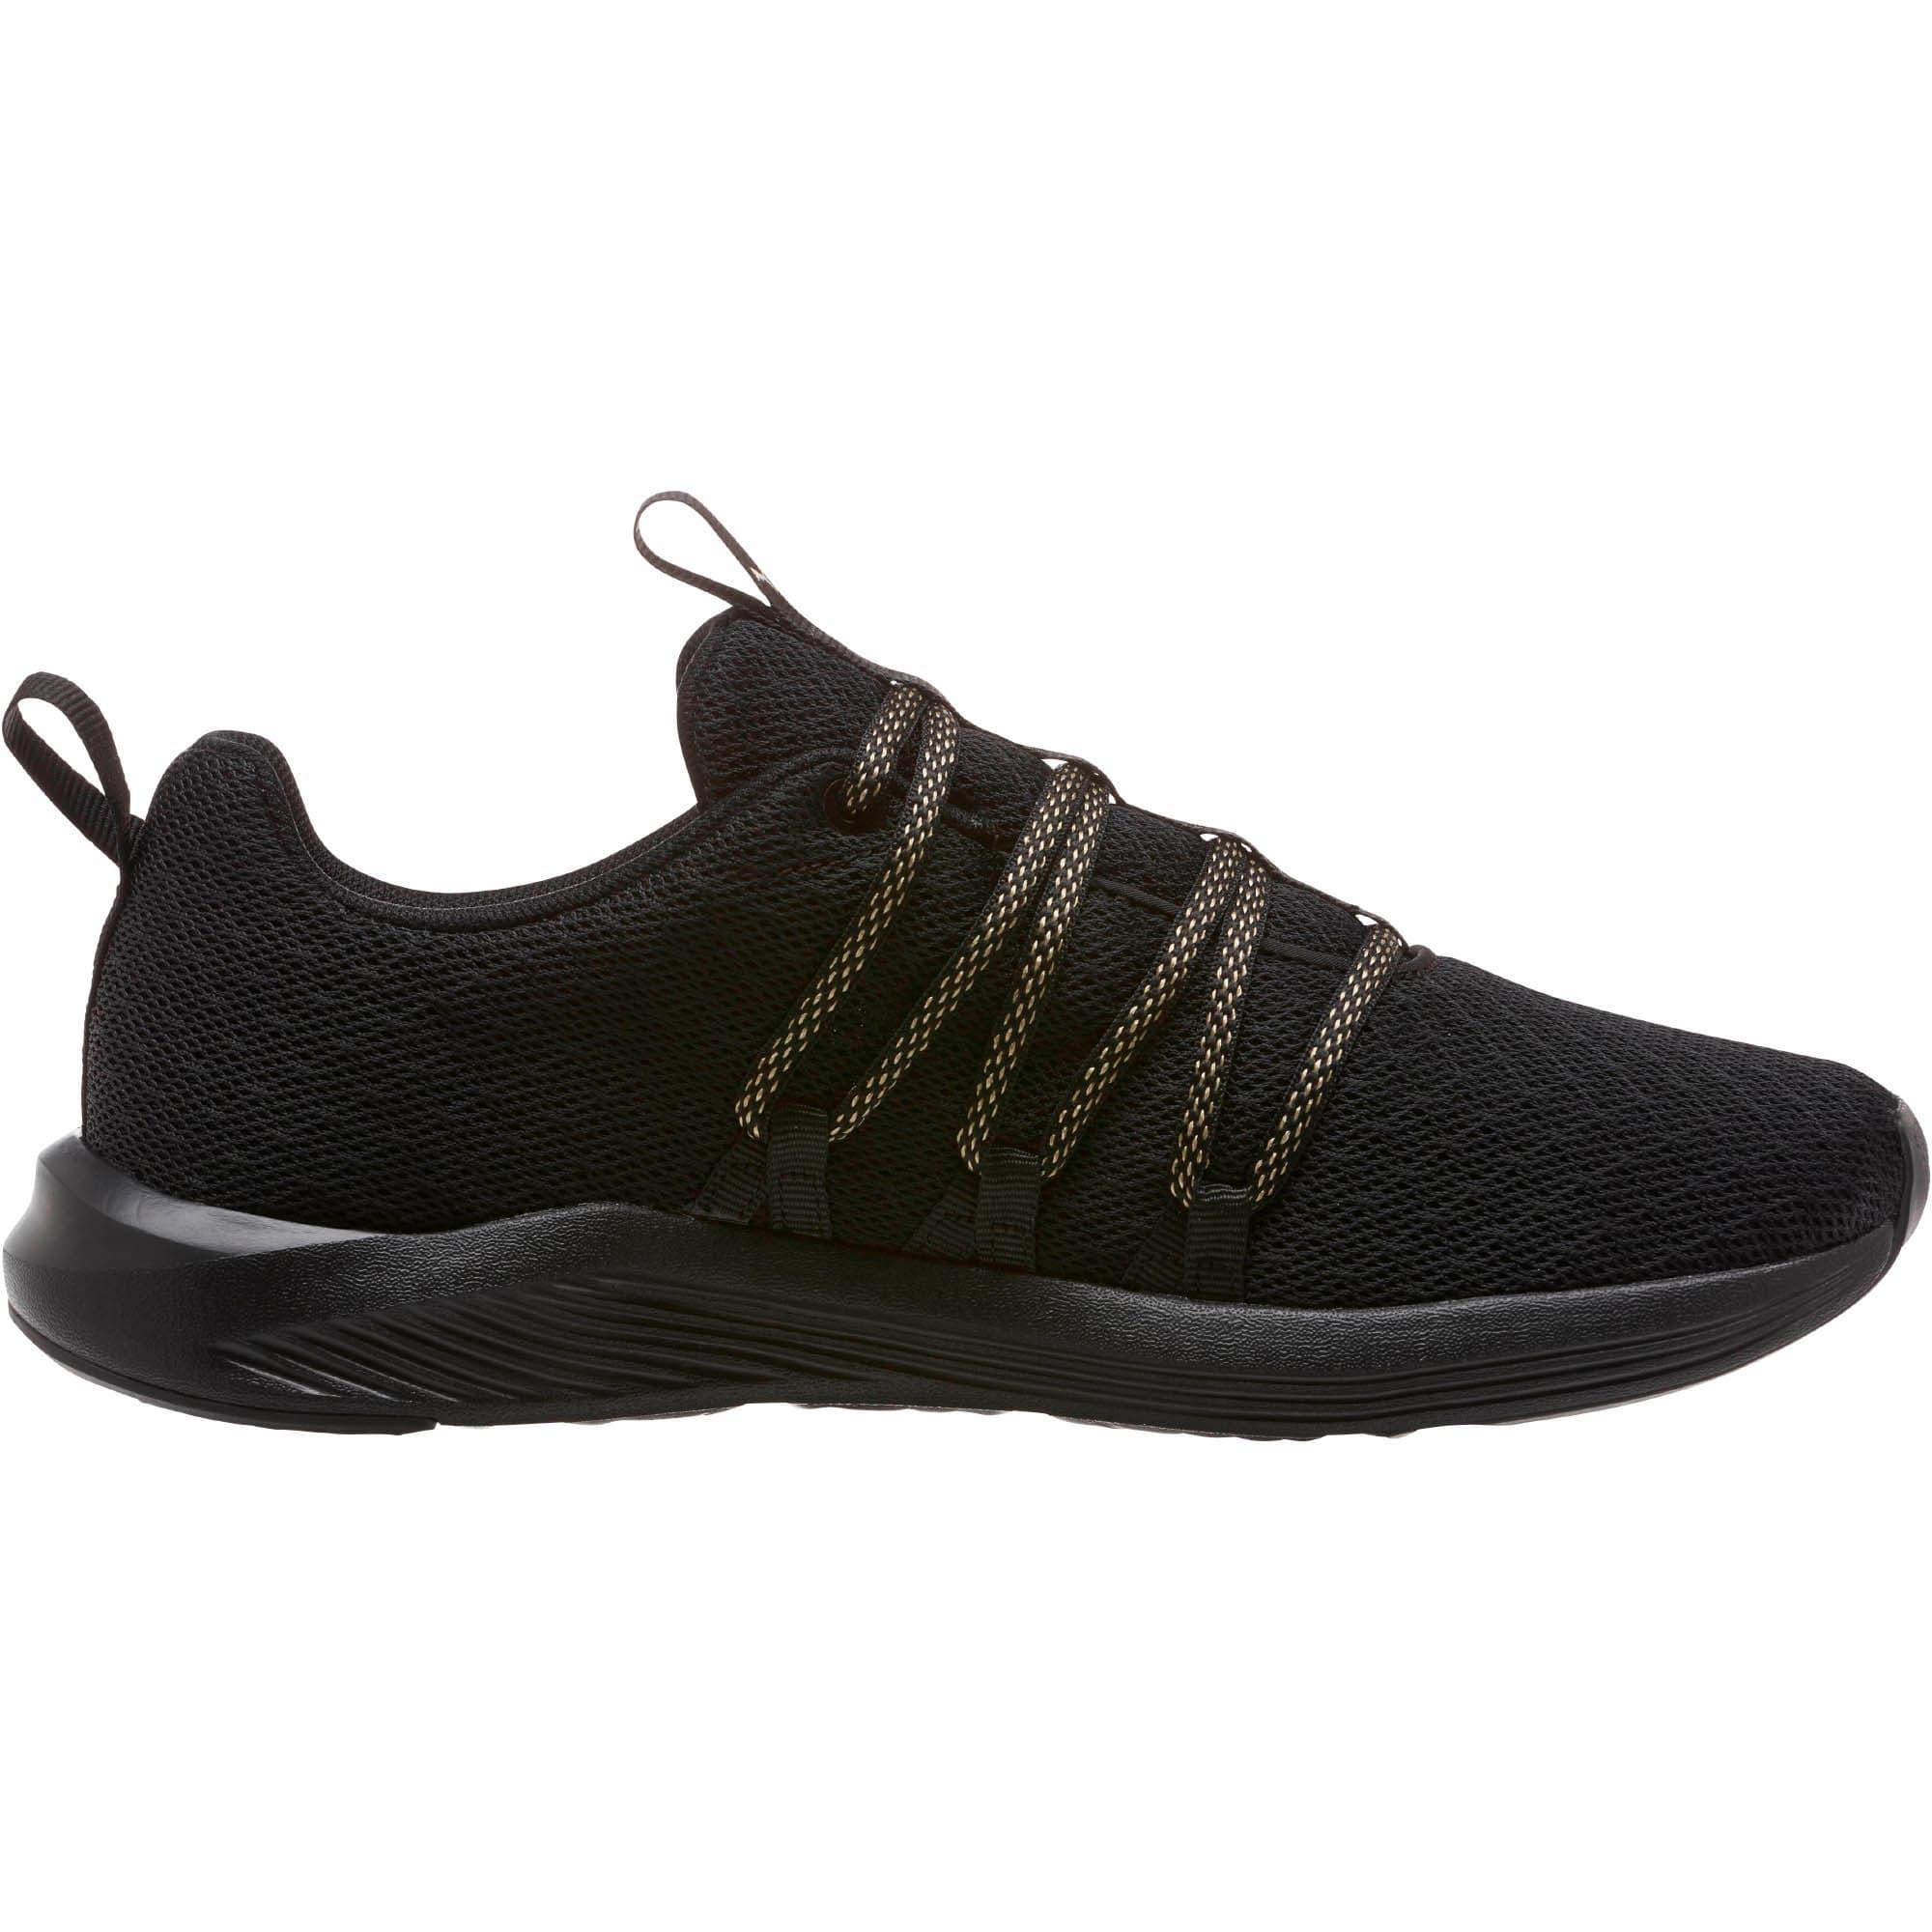 Thumbnail 3 of Prowl Alt Knit Mesh Women's Running Shoes, Puma Black-Metallic Gold, medium